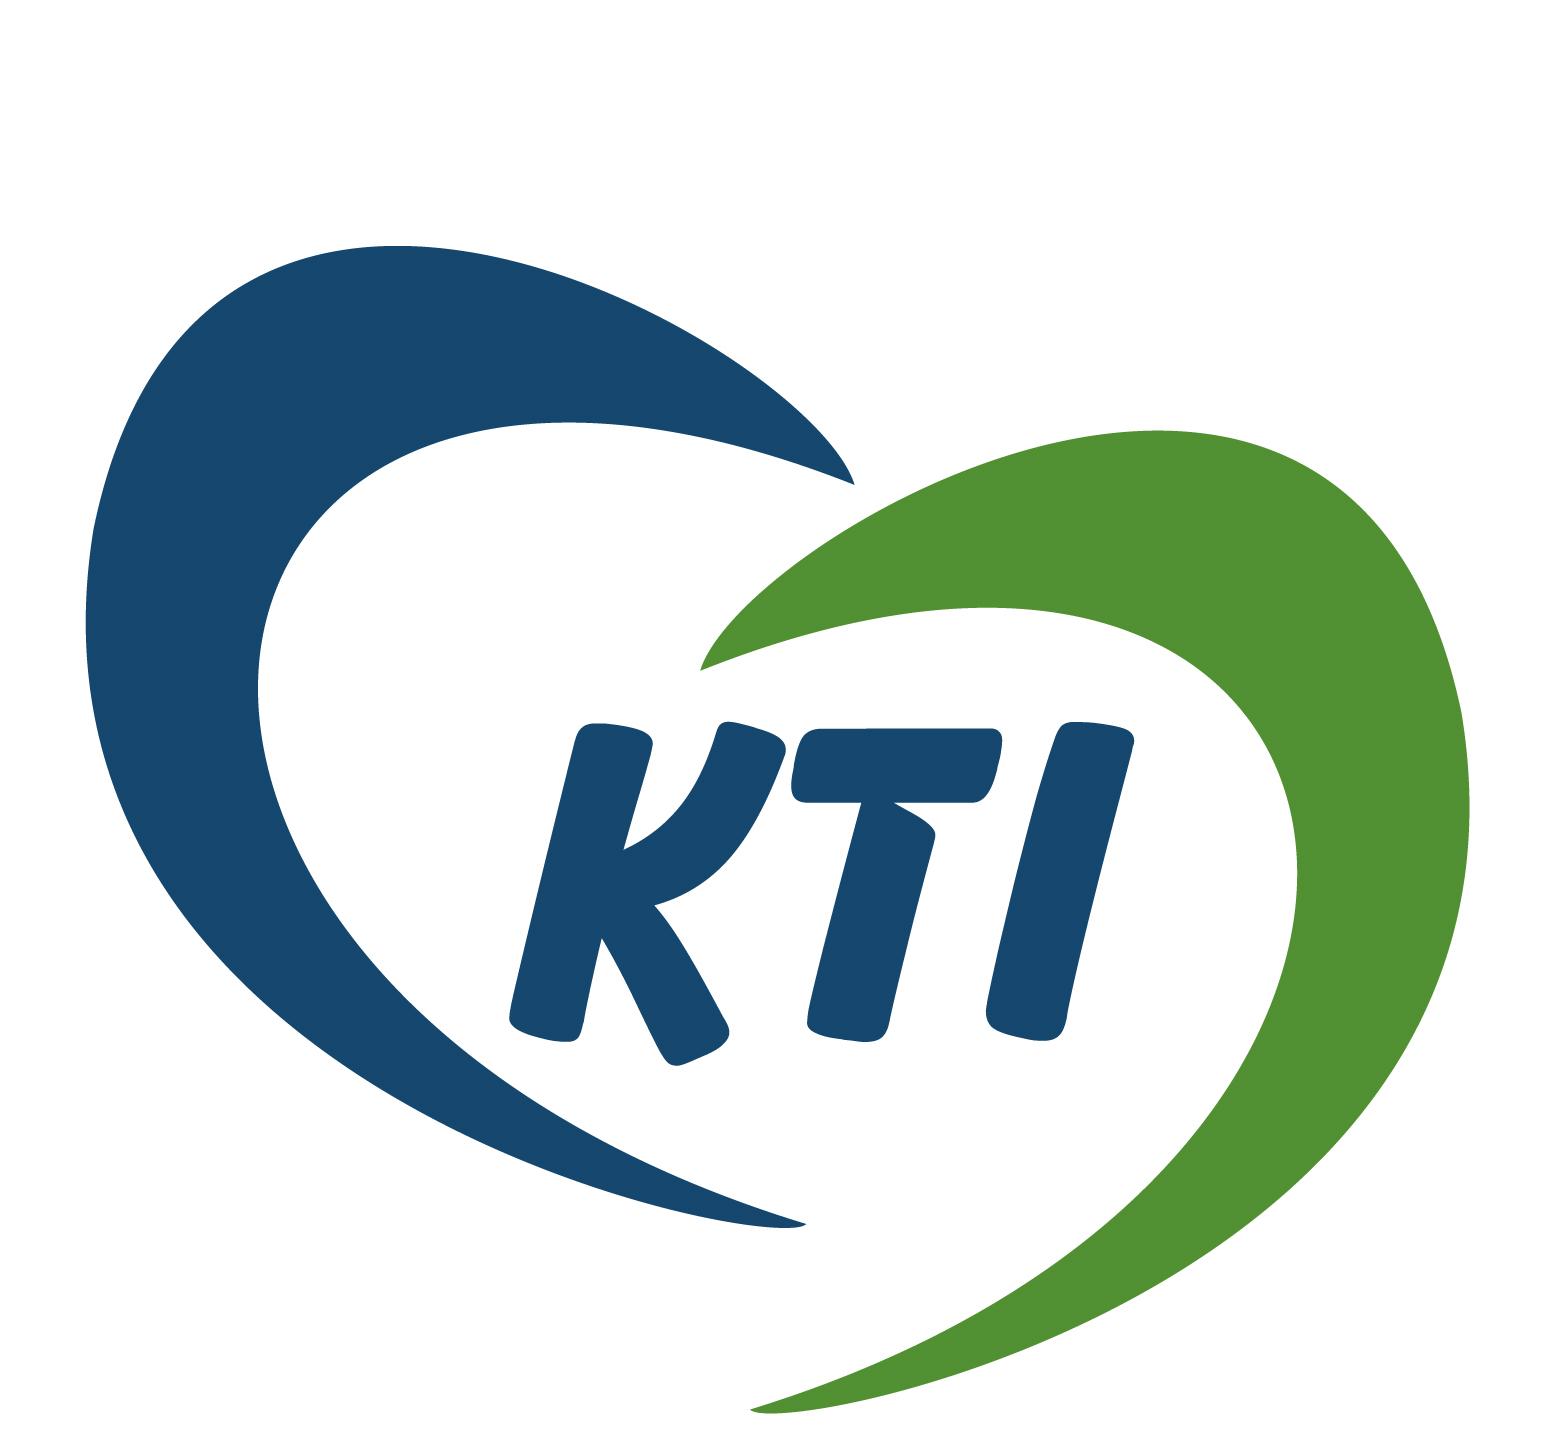 KTI LOGO OK [Converted]